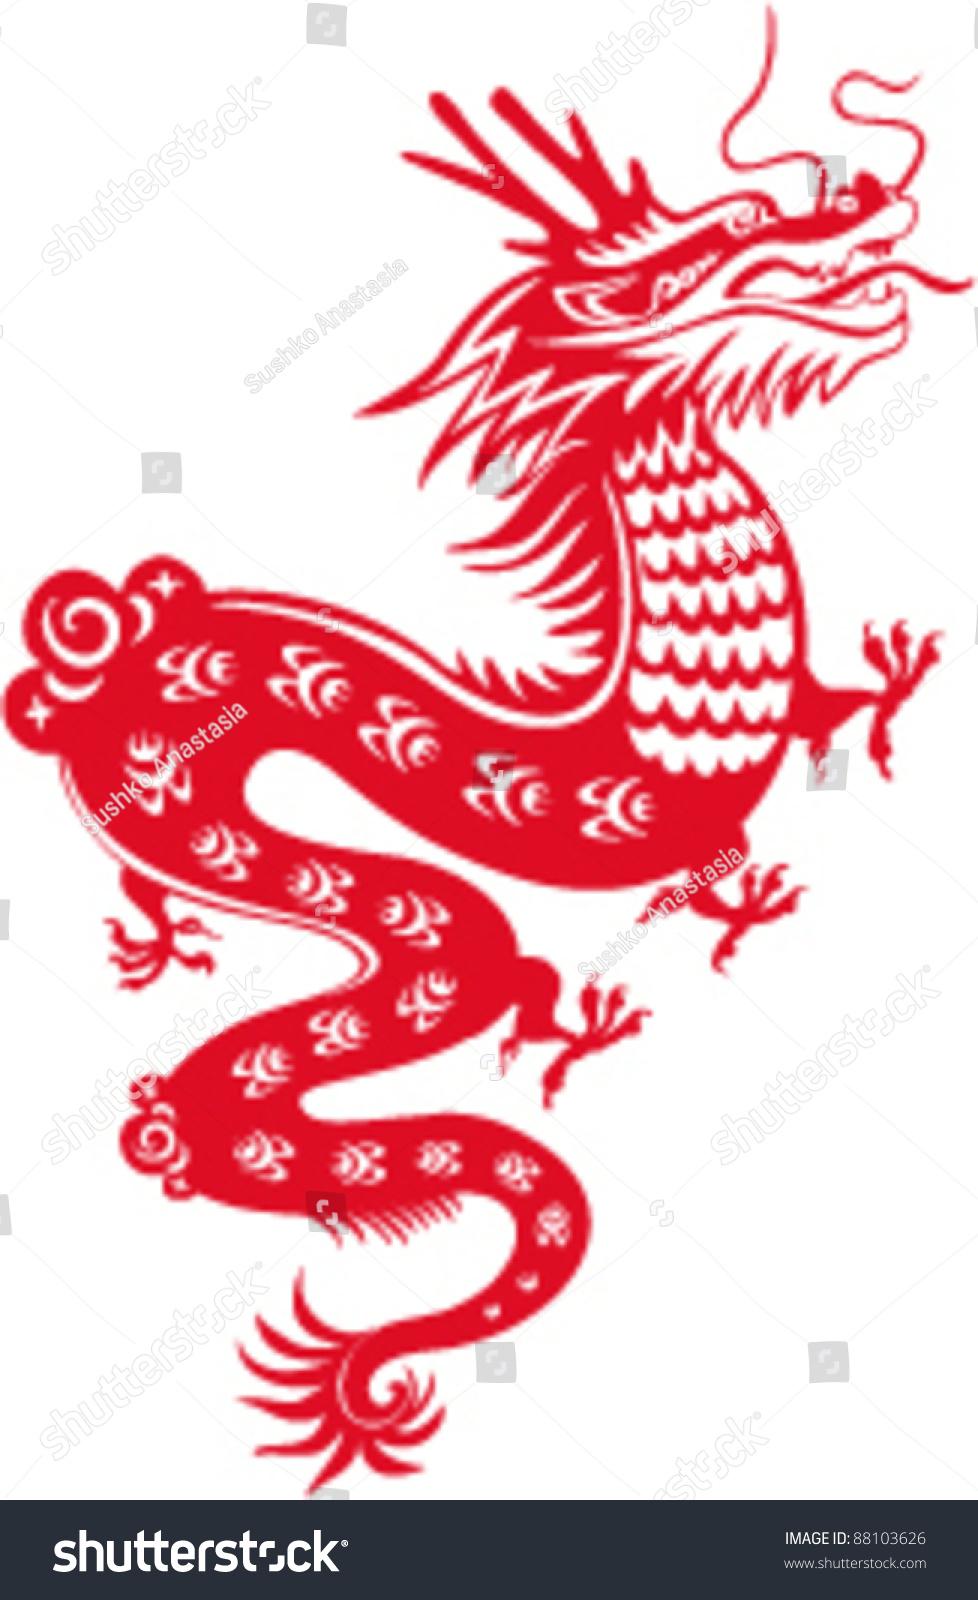 Dragon year 2012 chinese zodiac symbol stock vector 88103626 chinese zodiac symbol buycottarizona